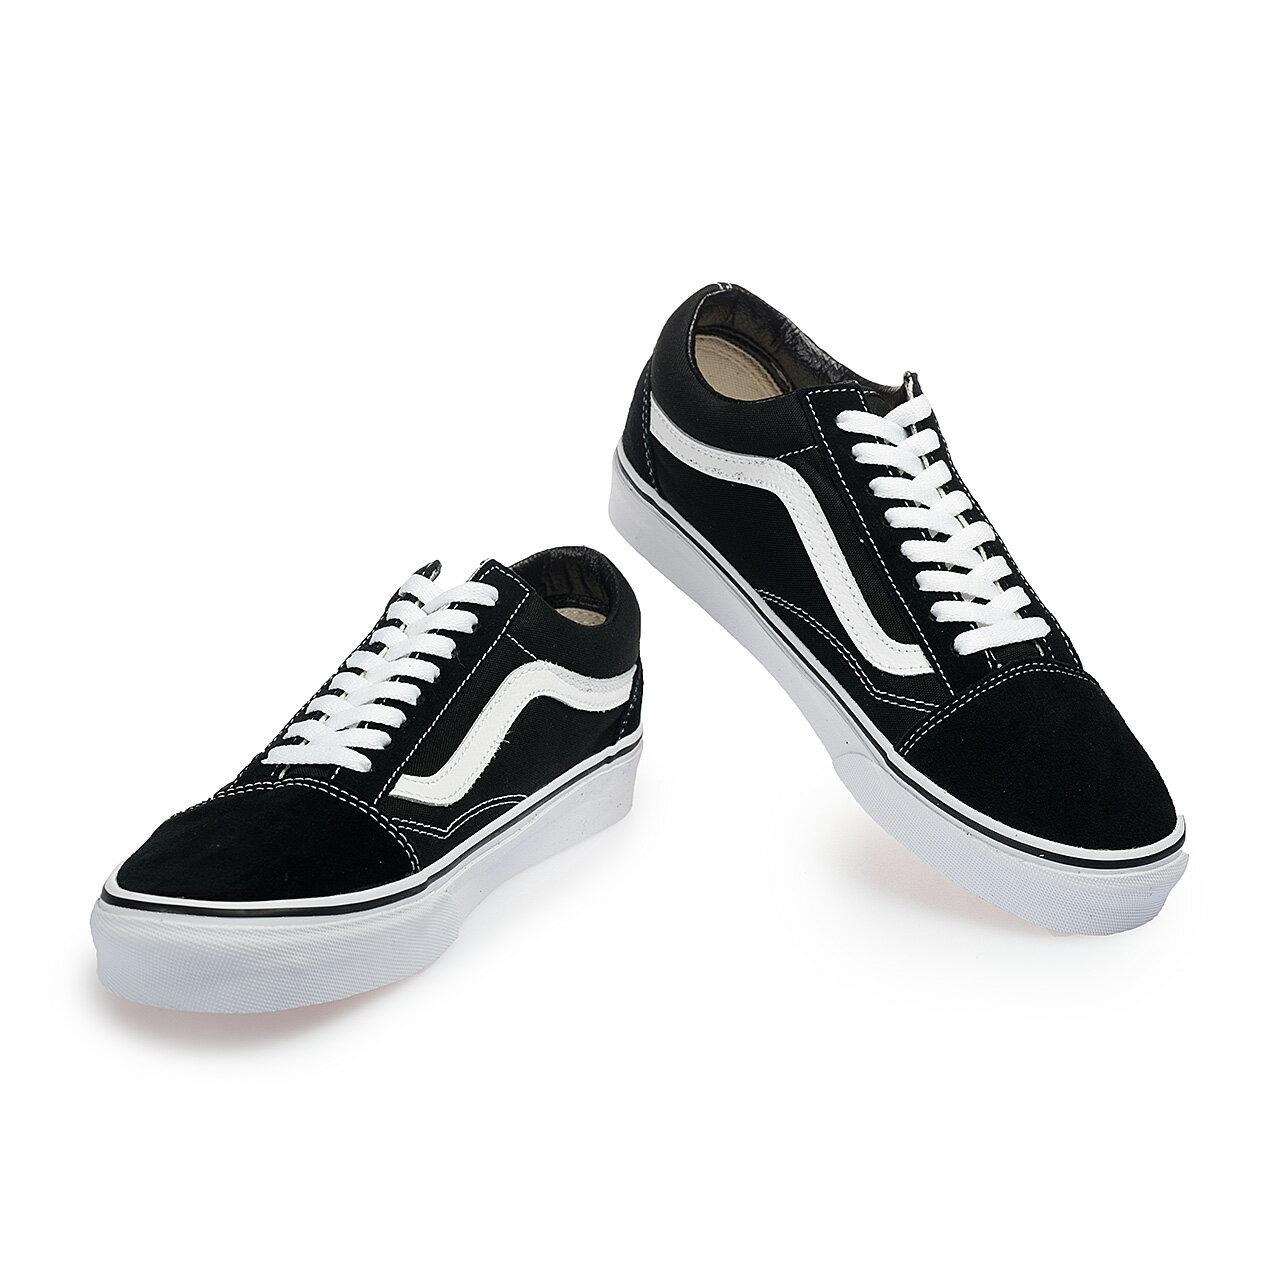 【VANS】Old Skool 基本款  黑 經典款 休閒鞋 男女 專櫃價2380  VN000D3HY28(palace store) 2